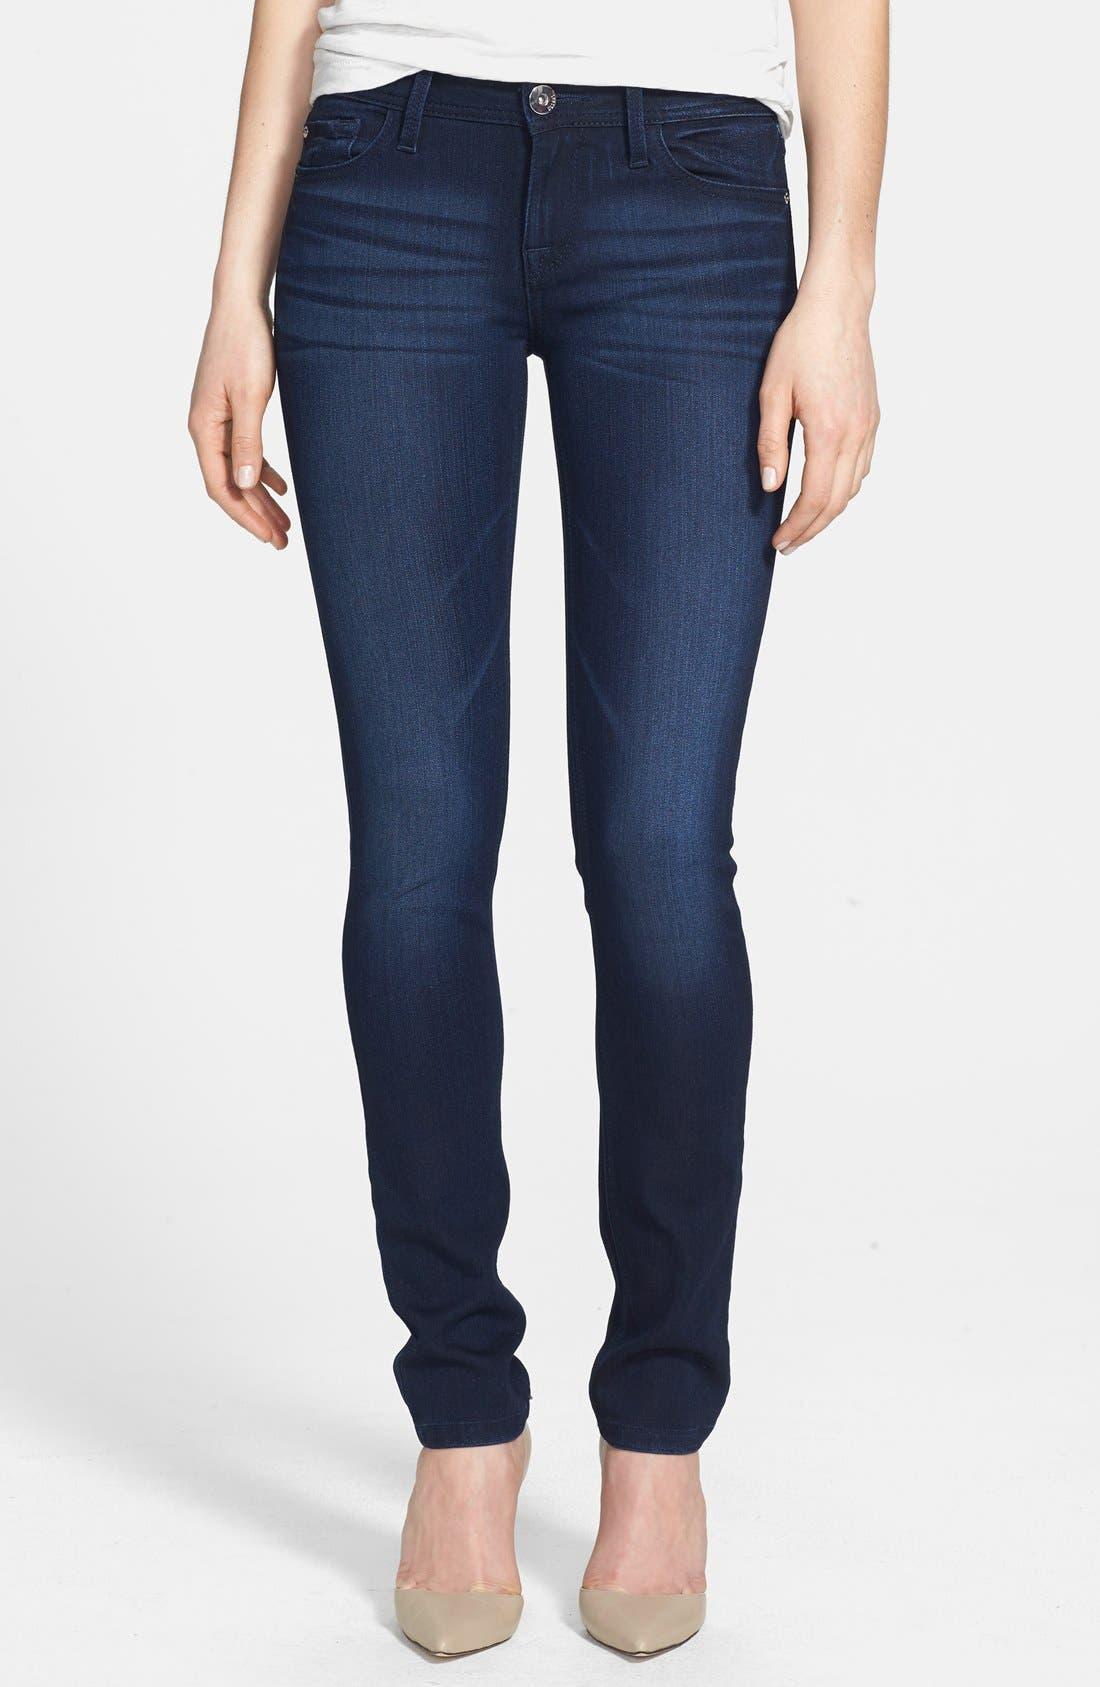 Alternate Image 1 Selected - DL1961 'Cindy' Slim Boot Jeans (Wooster)